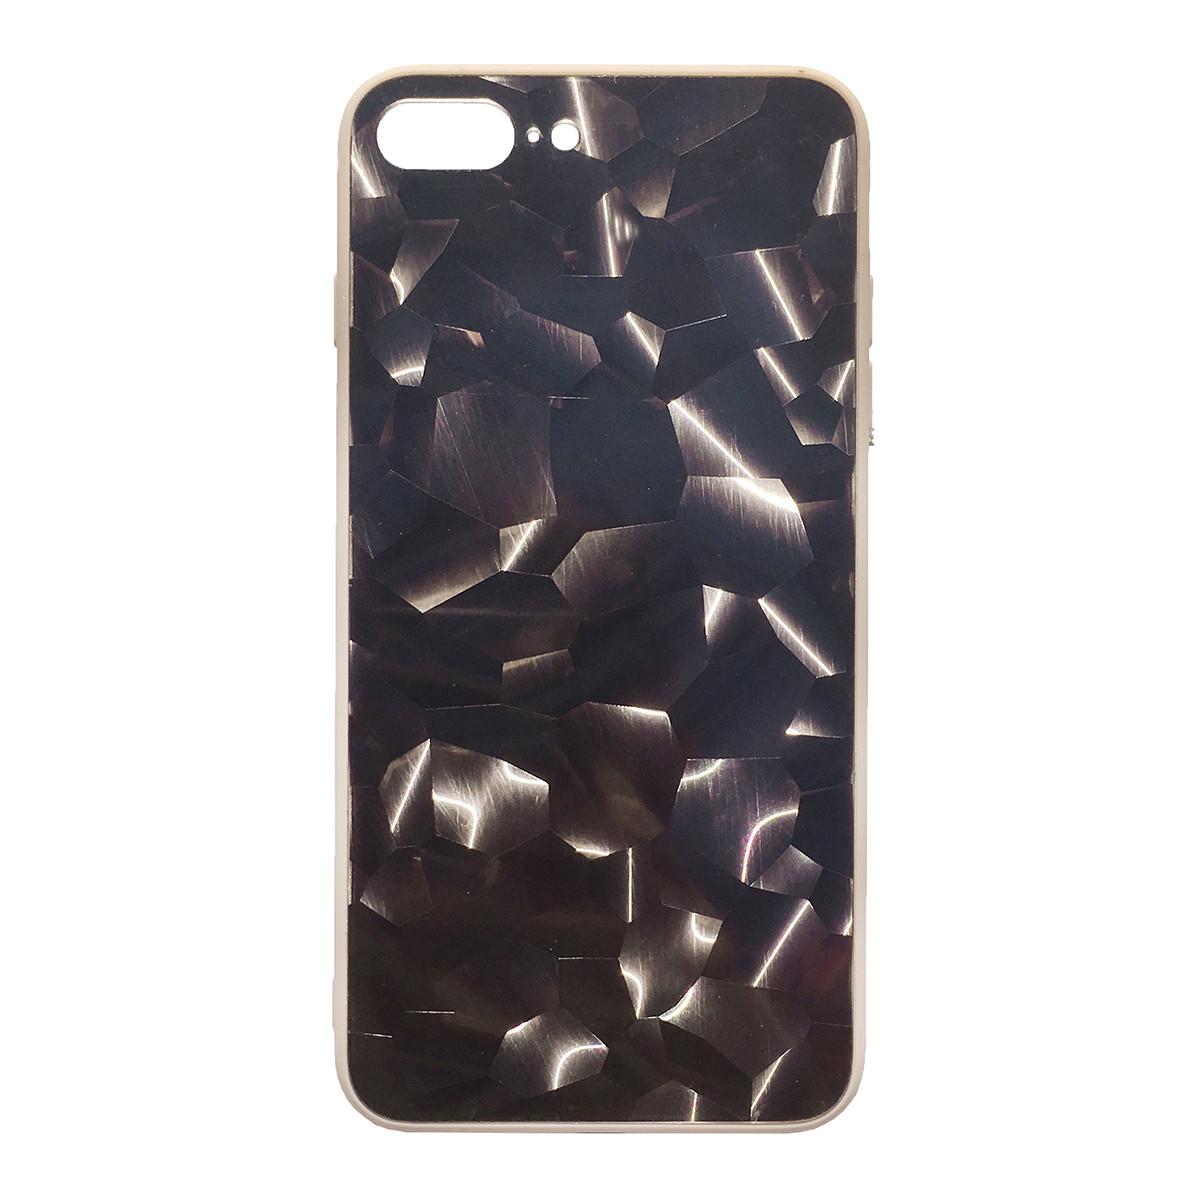 Чехол накладка xCase для iPhone 7 Plus/8 Plus Mystic Case gold